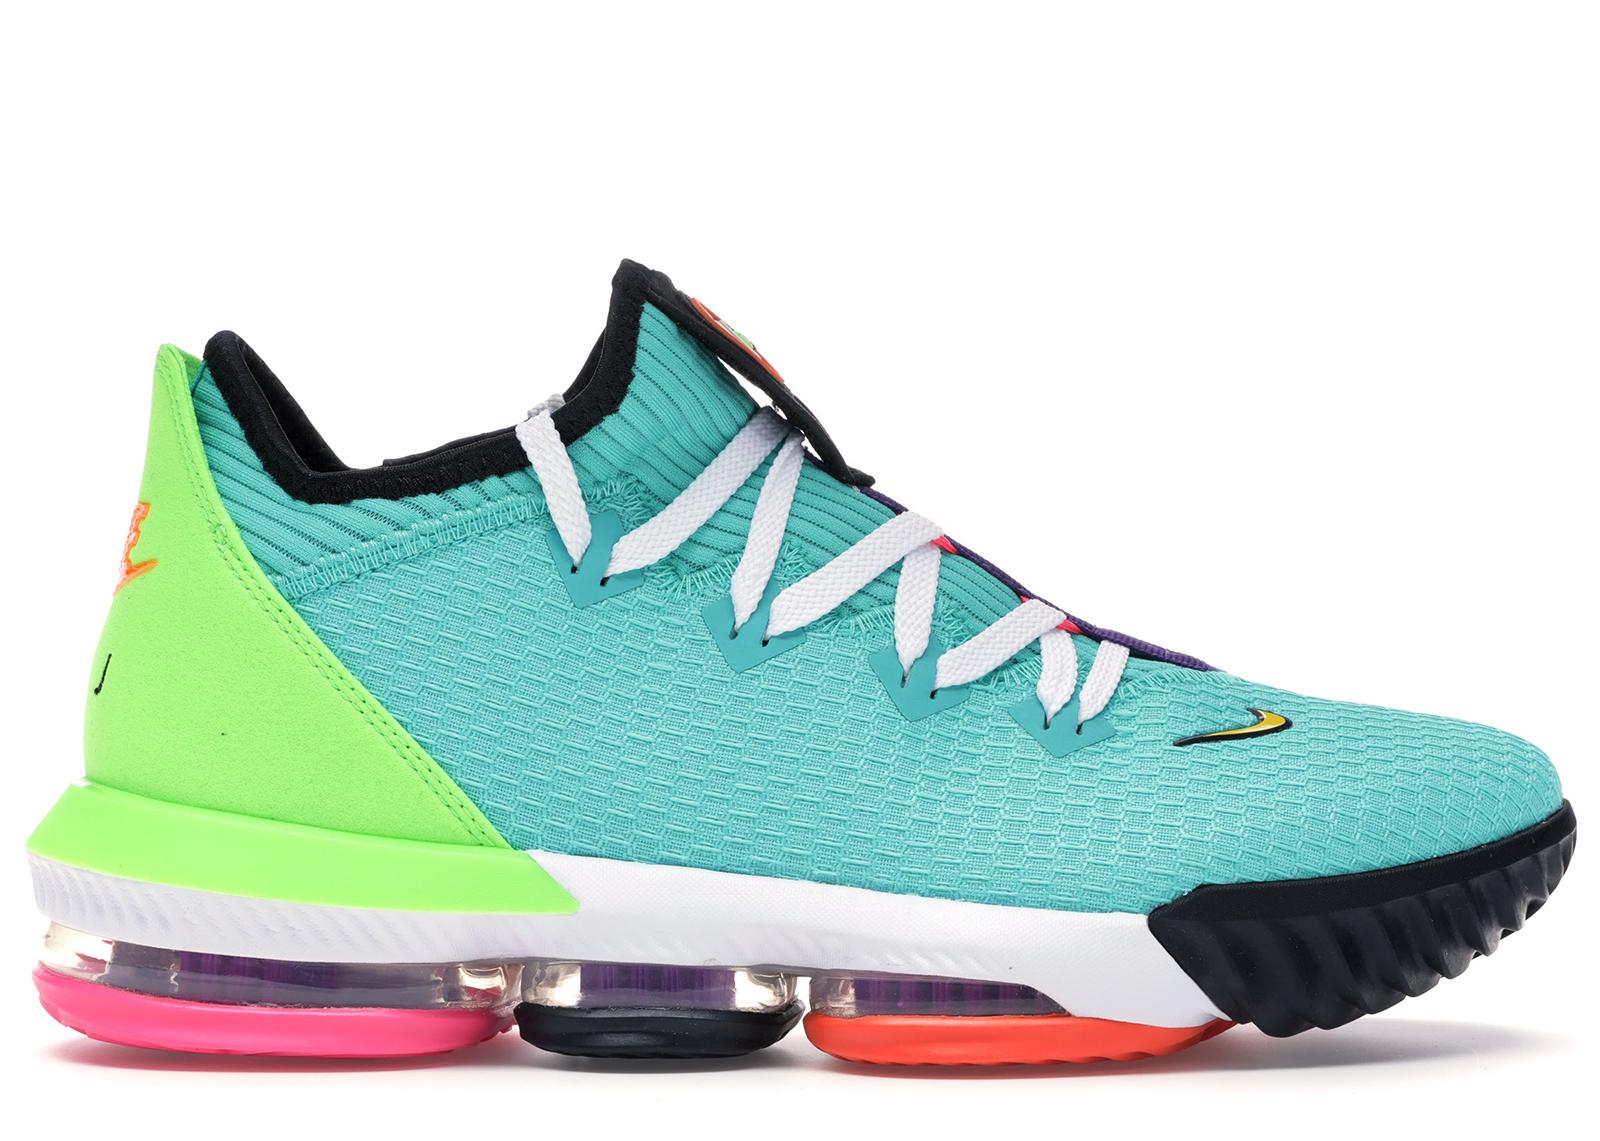 Buy Nike LeBron Shoes & Deadstock Sneakers